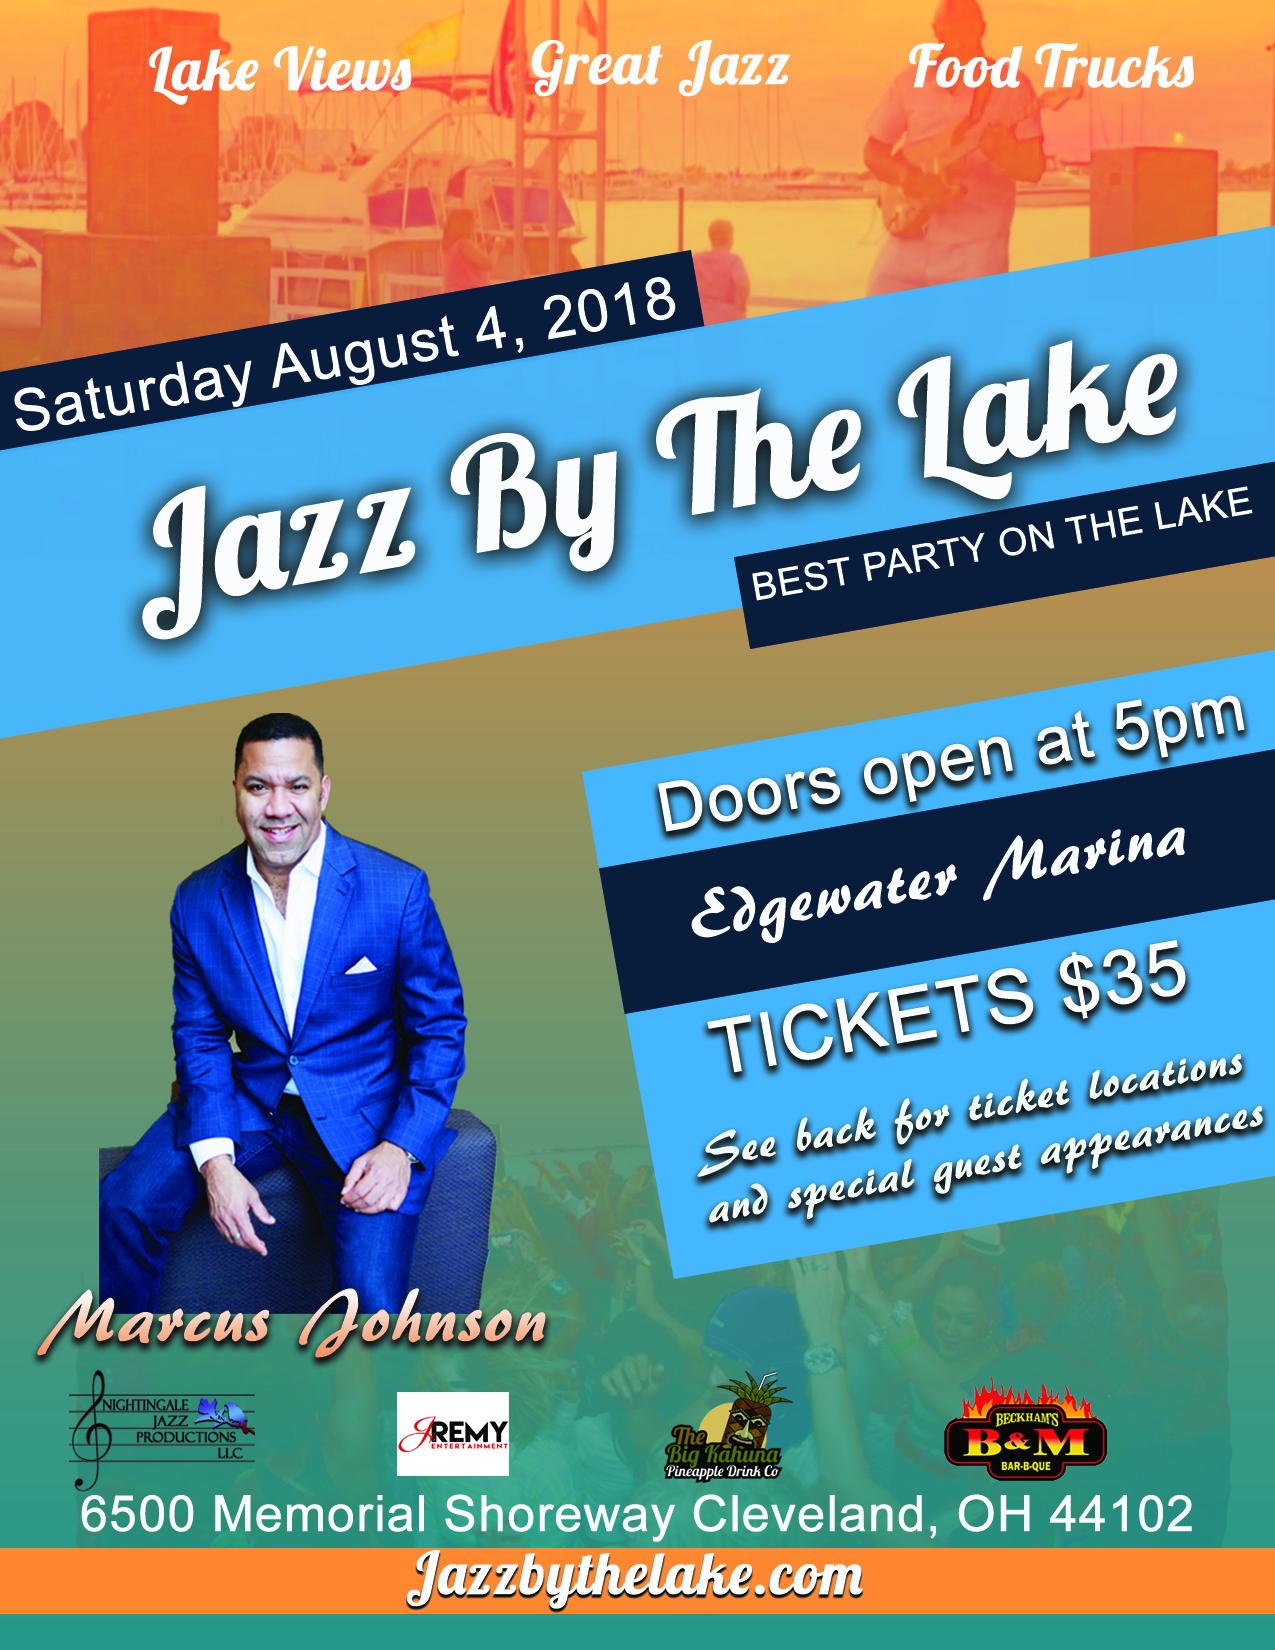 Jazz by the lake 2018 7-5-18.jpg